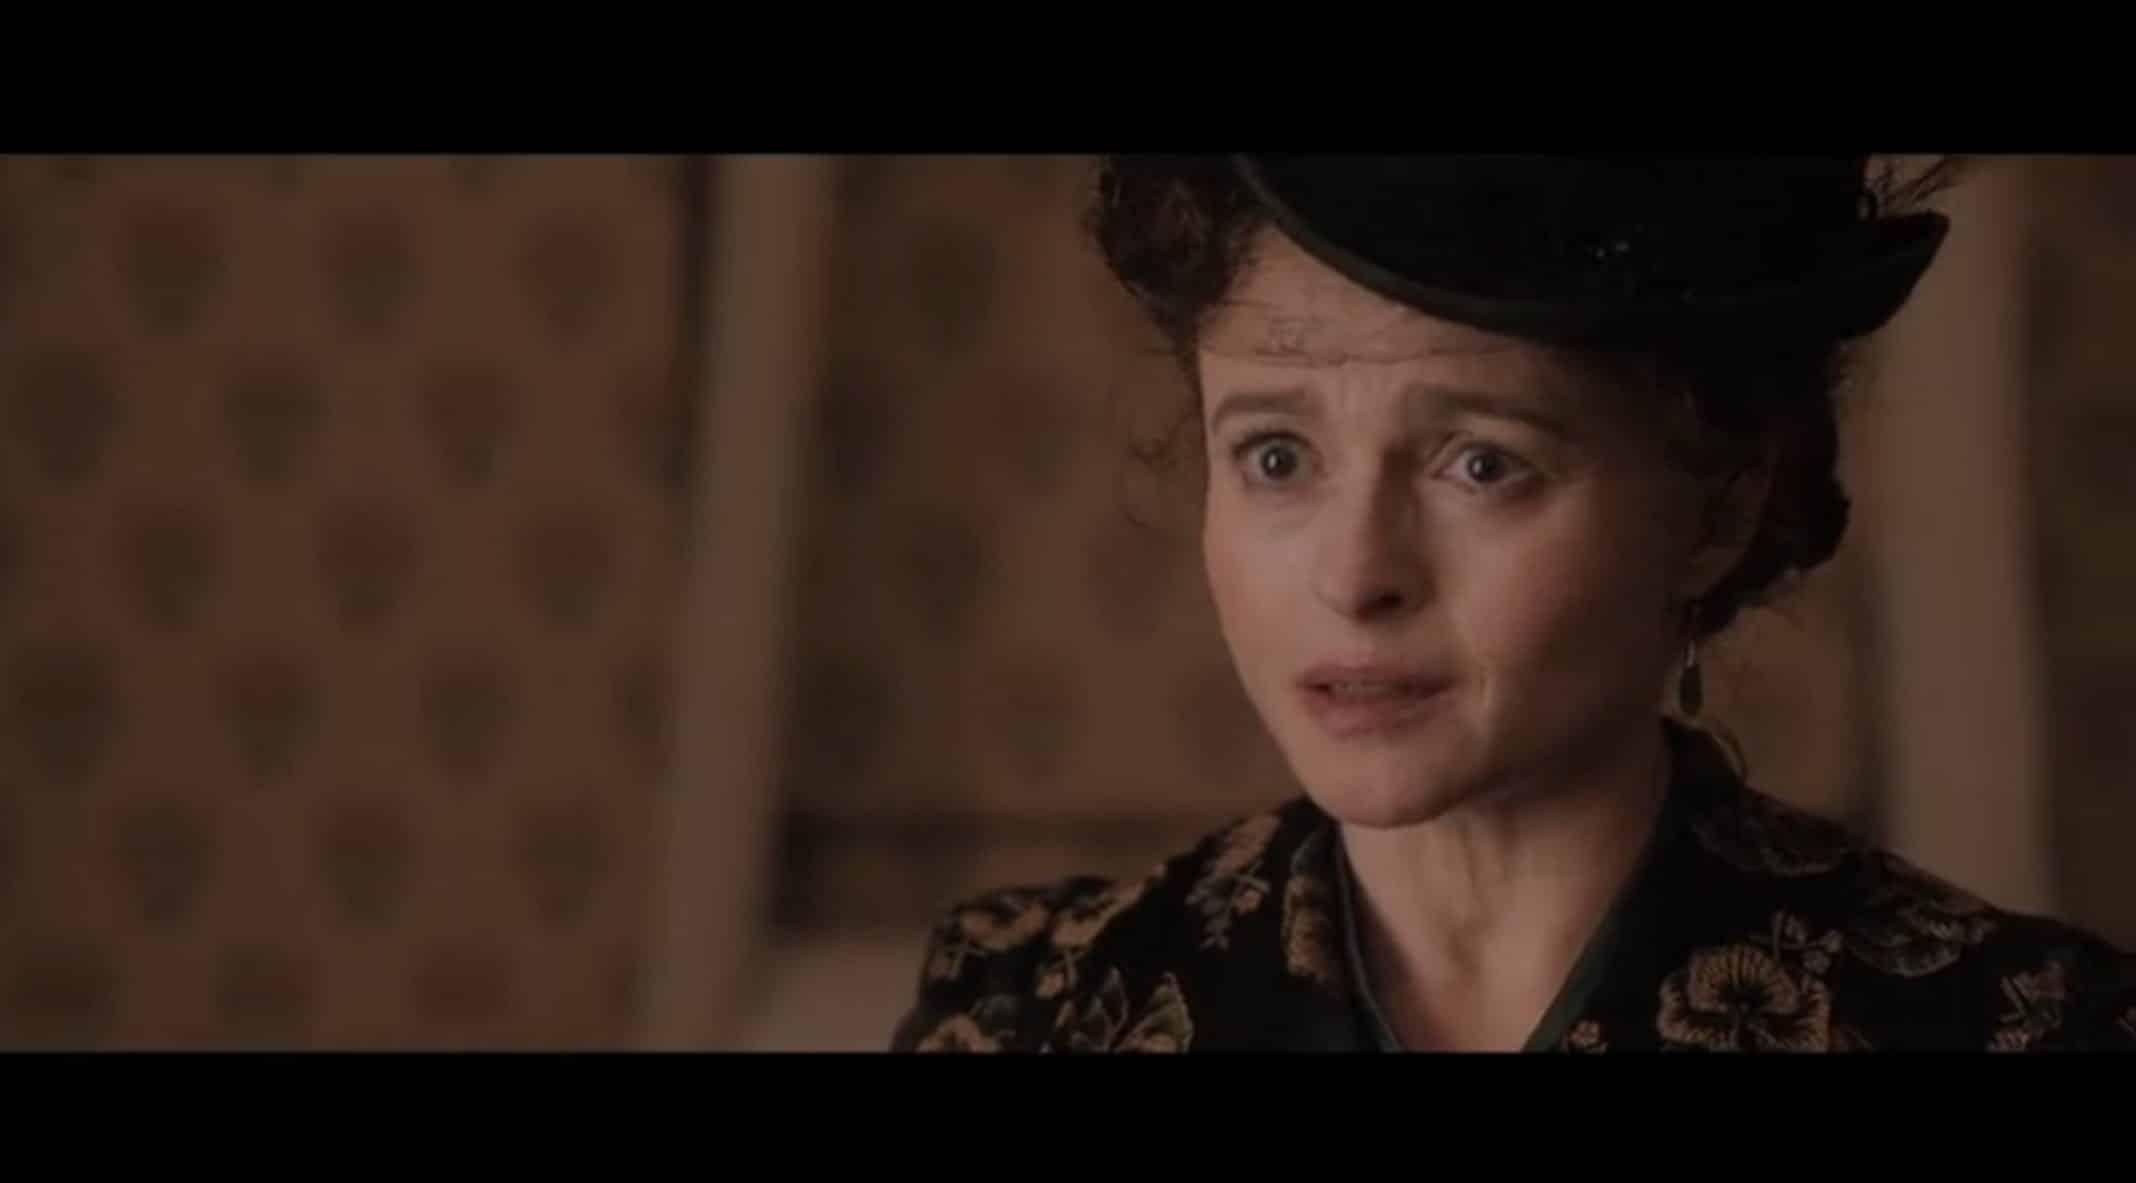 Eudoria Holmes (Helena Bonham Carter) appearing before Enola